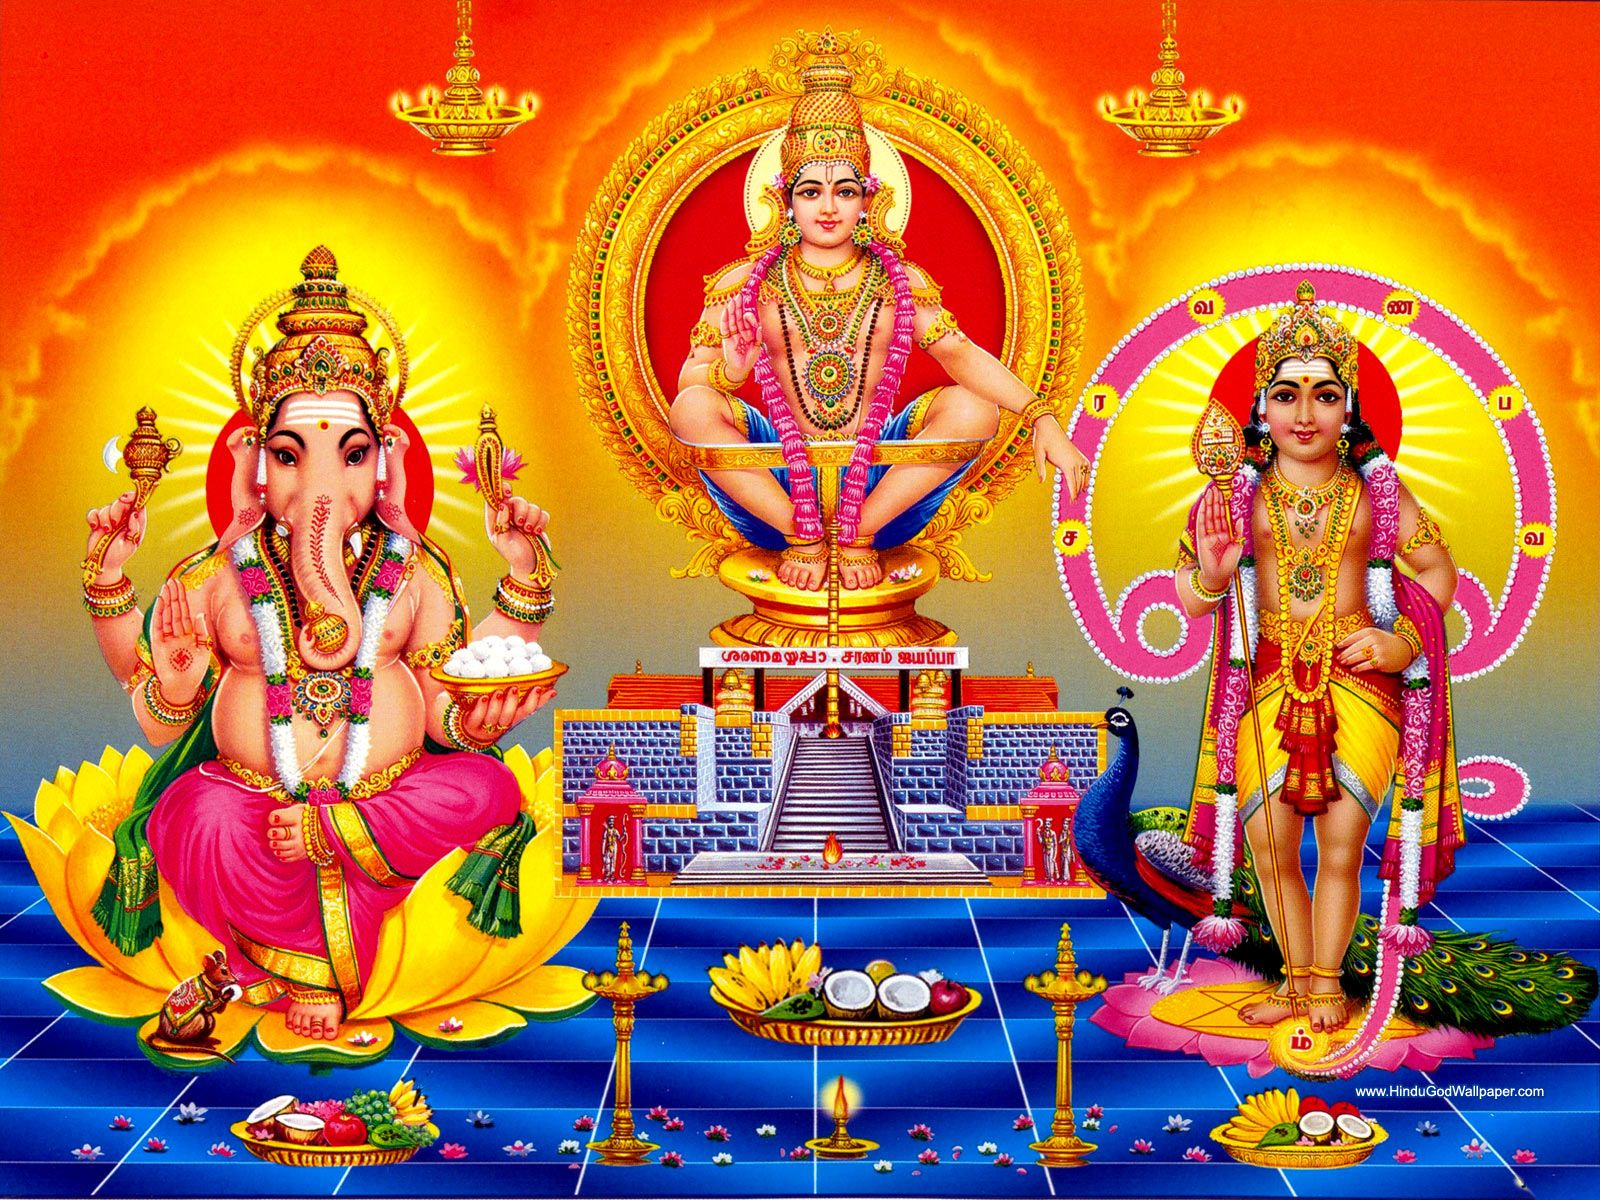 Simple Wallpaper High Quality Lord Ayyappa - b4f55f99b26153d4e0c328f6e36936f7  Gallery_661094.jpg